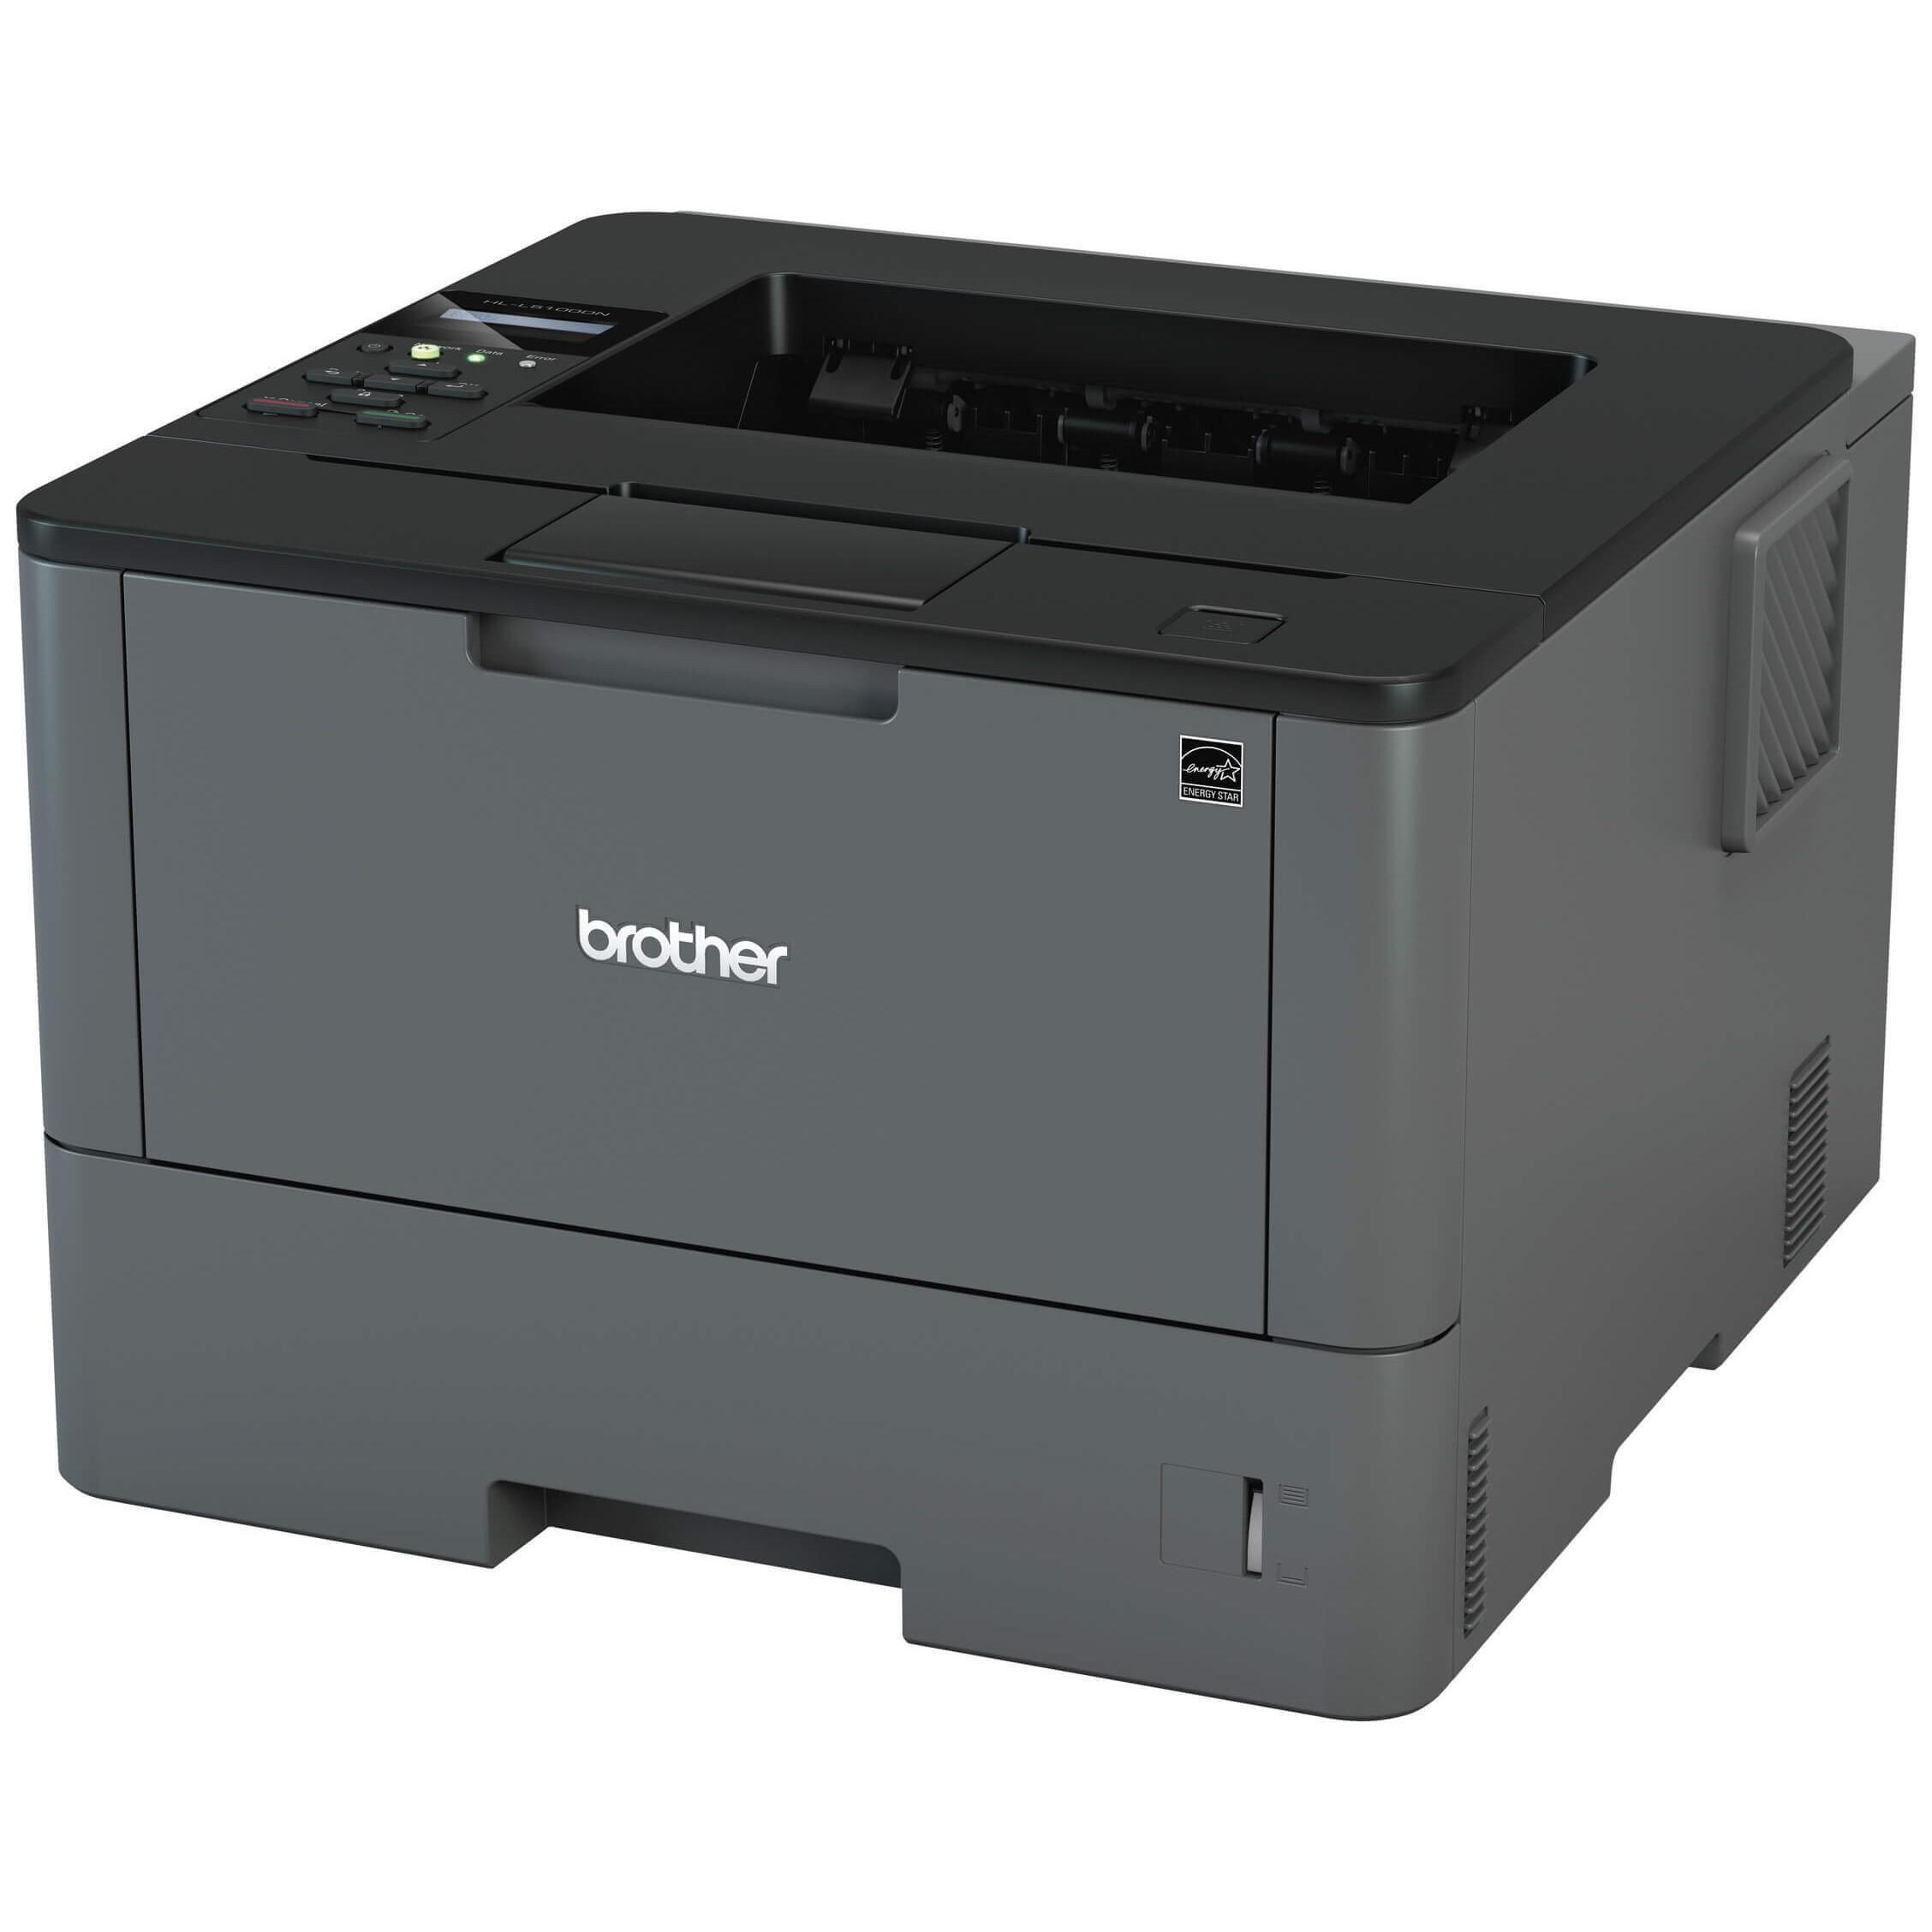 Impressora Brother HL L5102DW Laser WiFi | Impressora.com